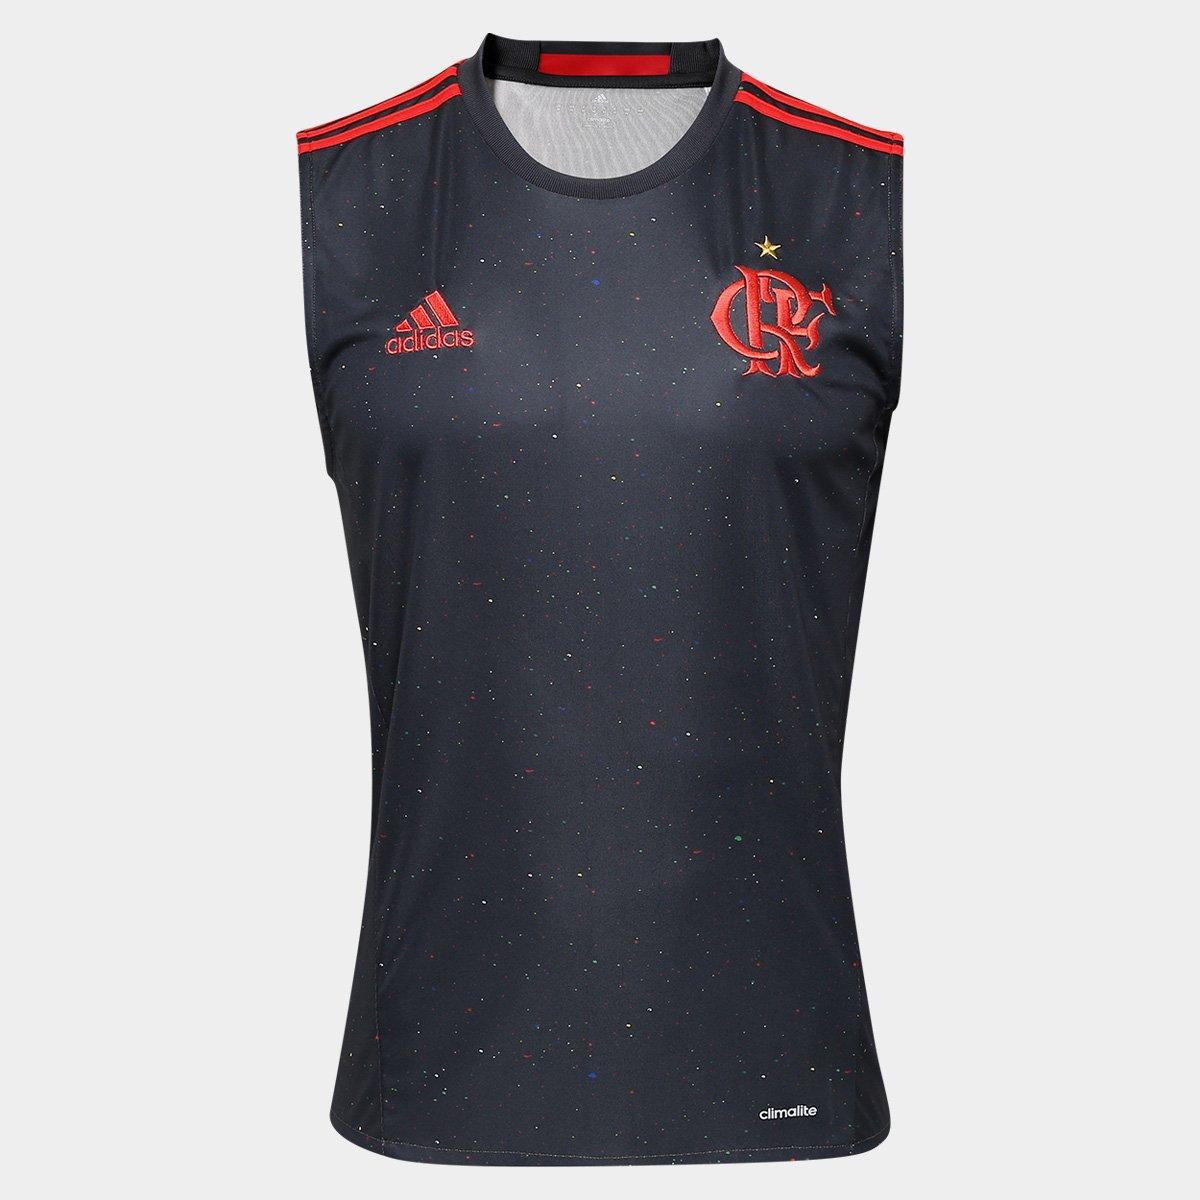 Camiseta Regata Flamengo Adidas Especial Masculina - Compre Agora ... 8f698cd119939